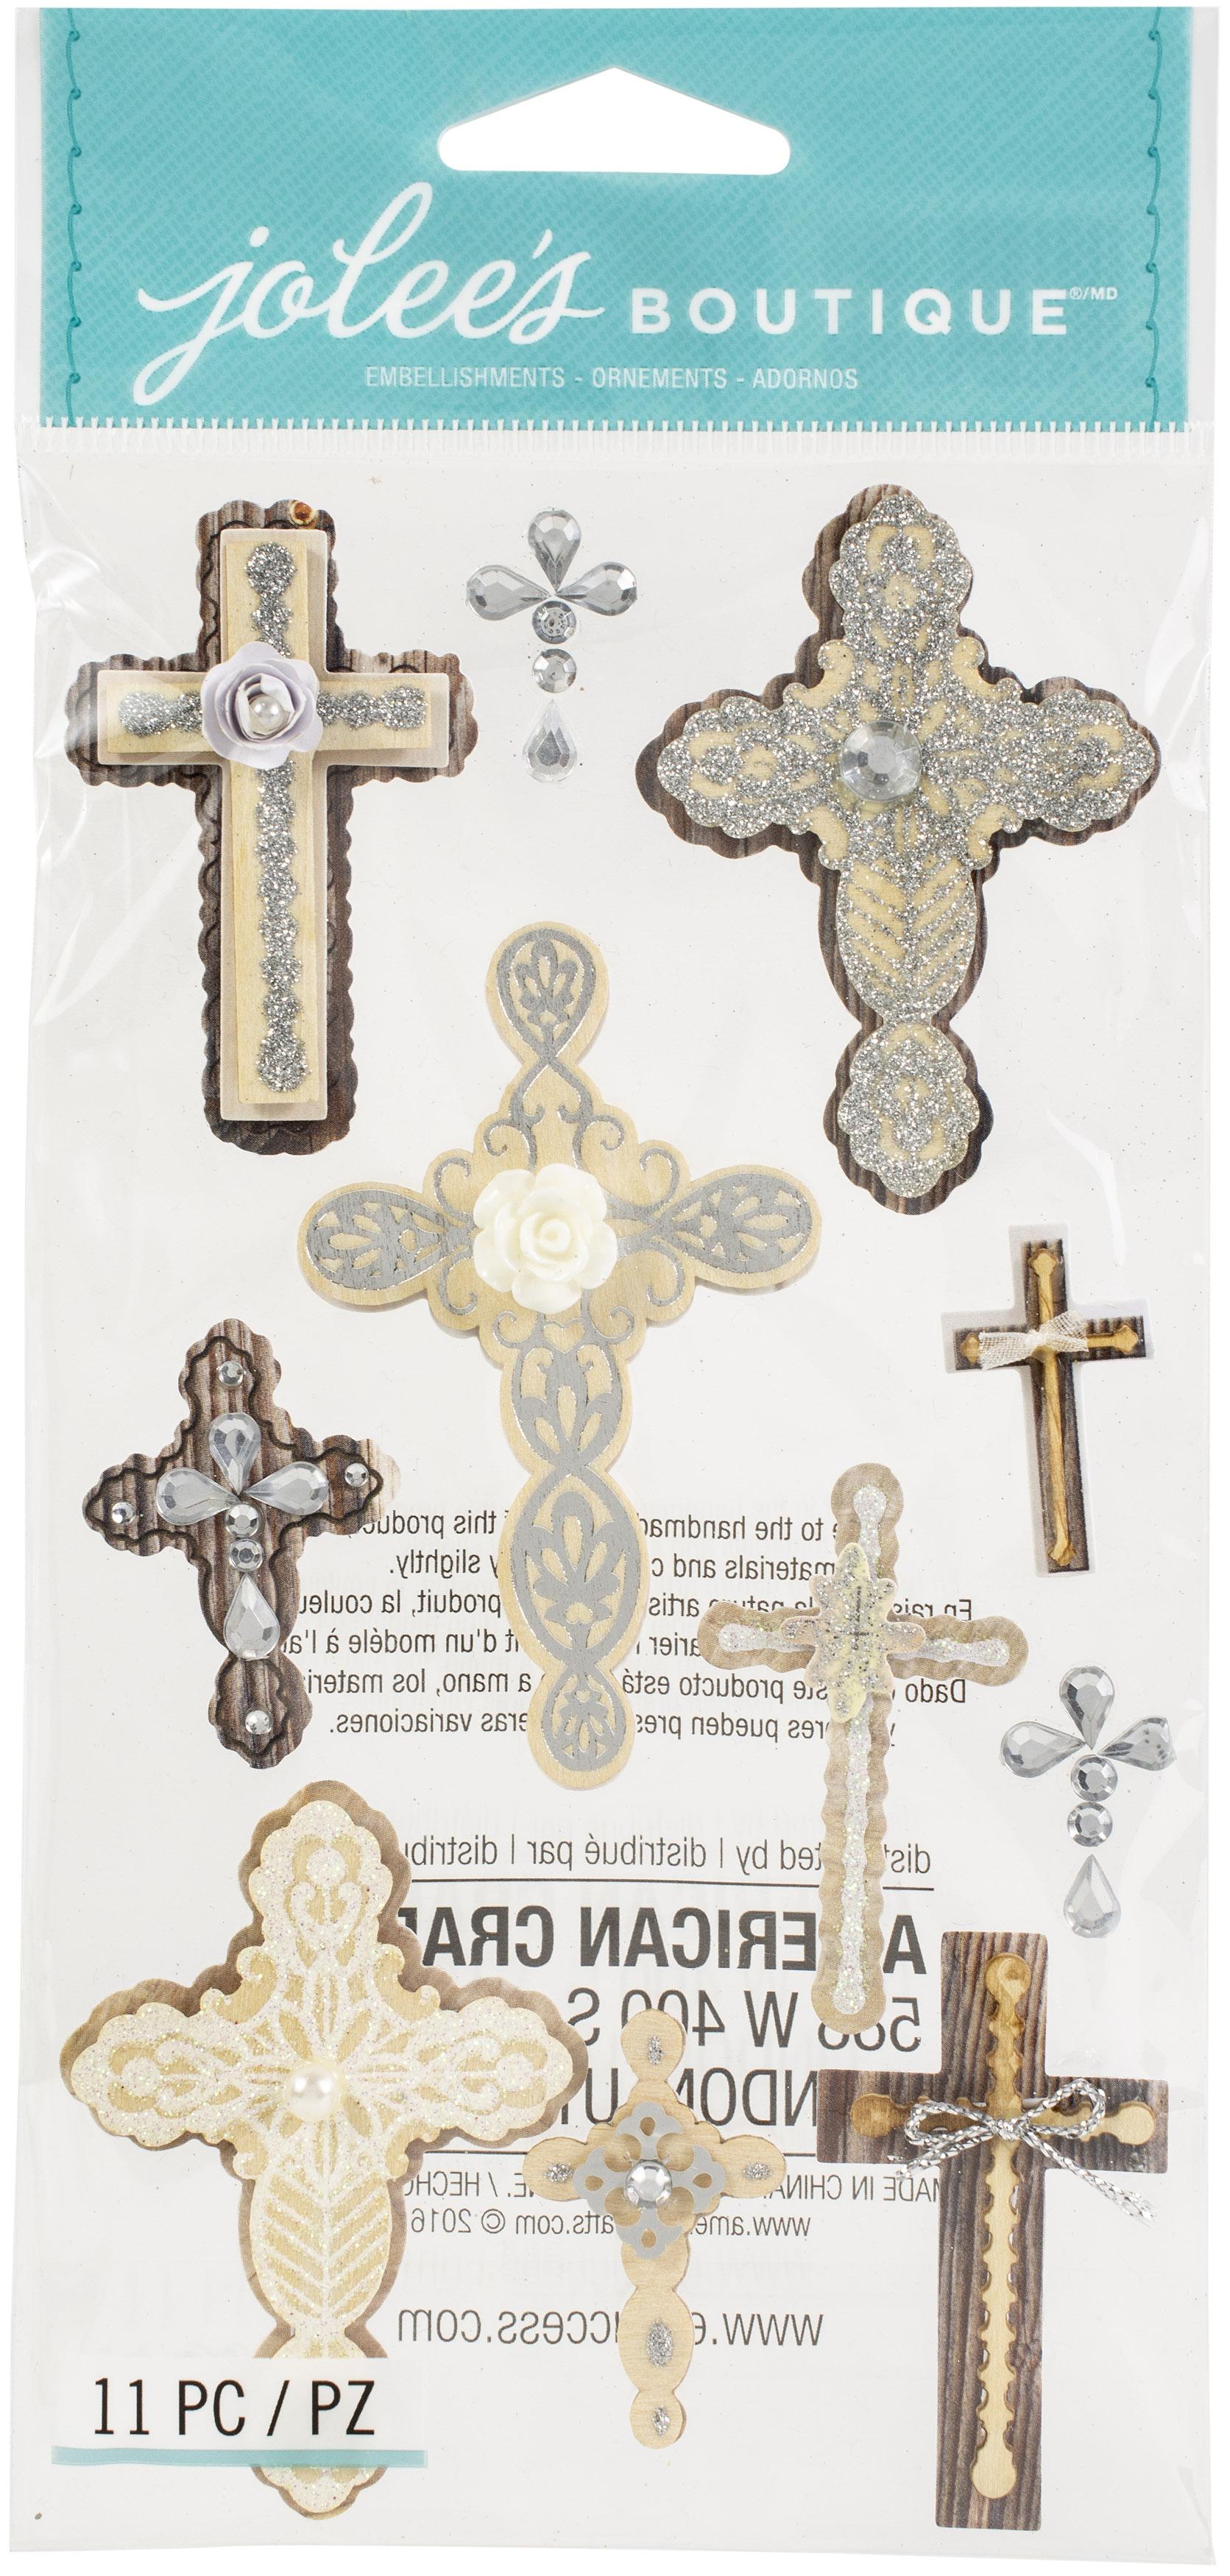 Jolee's Boutique Themed Embellishments-Inspirational Crosses